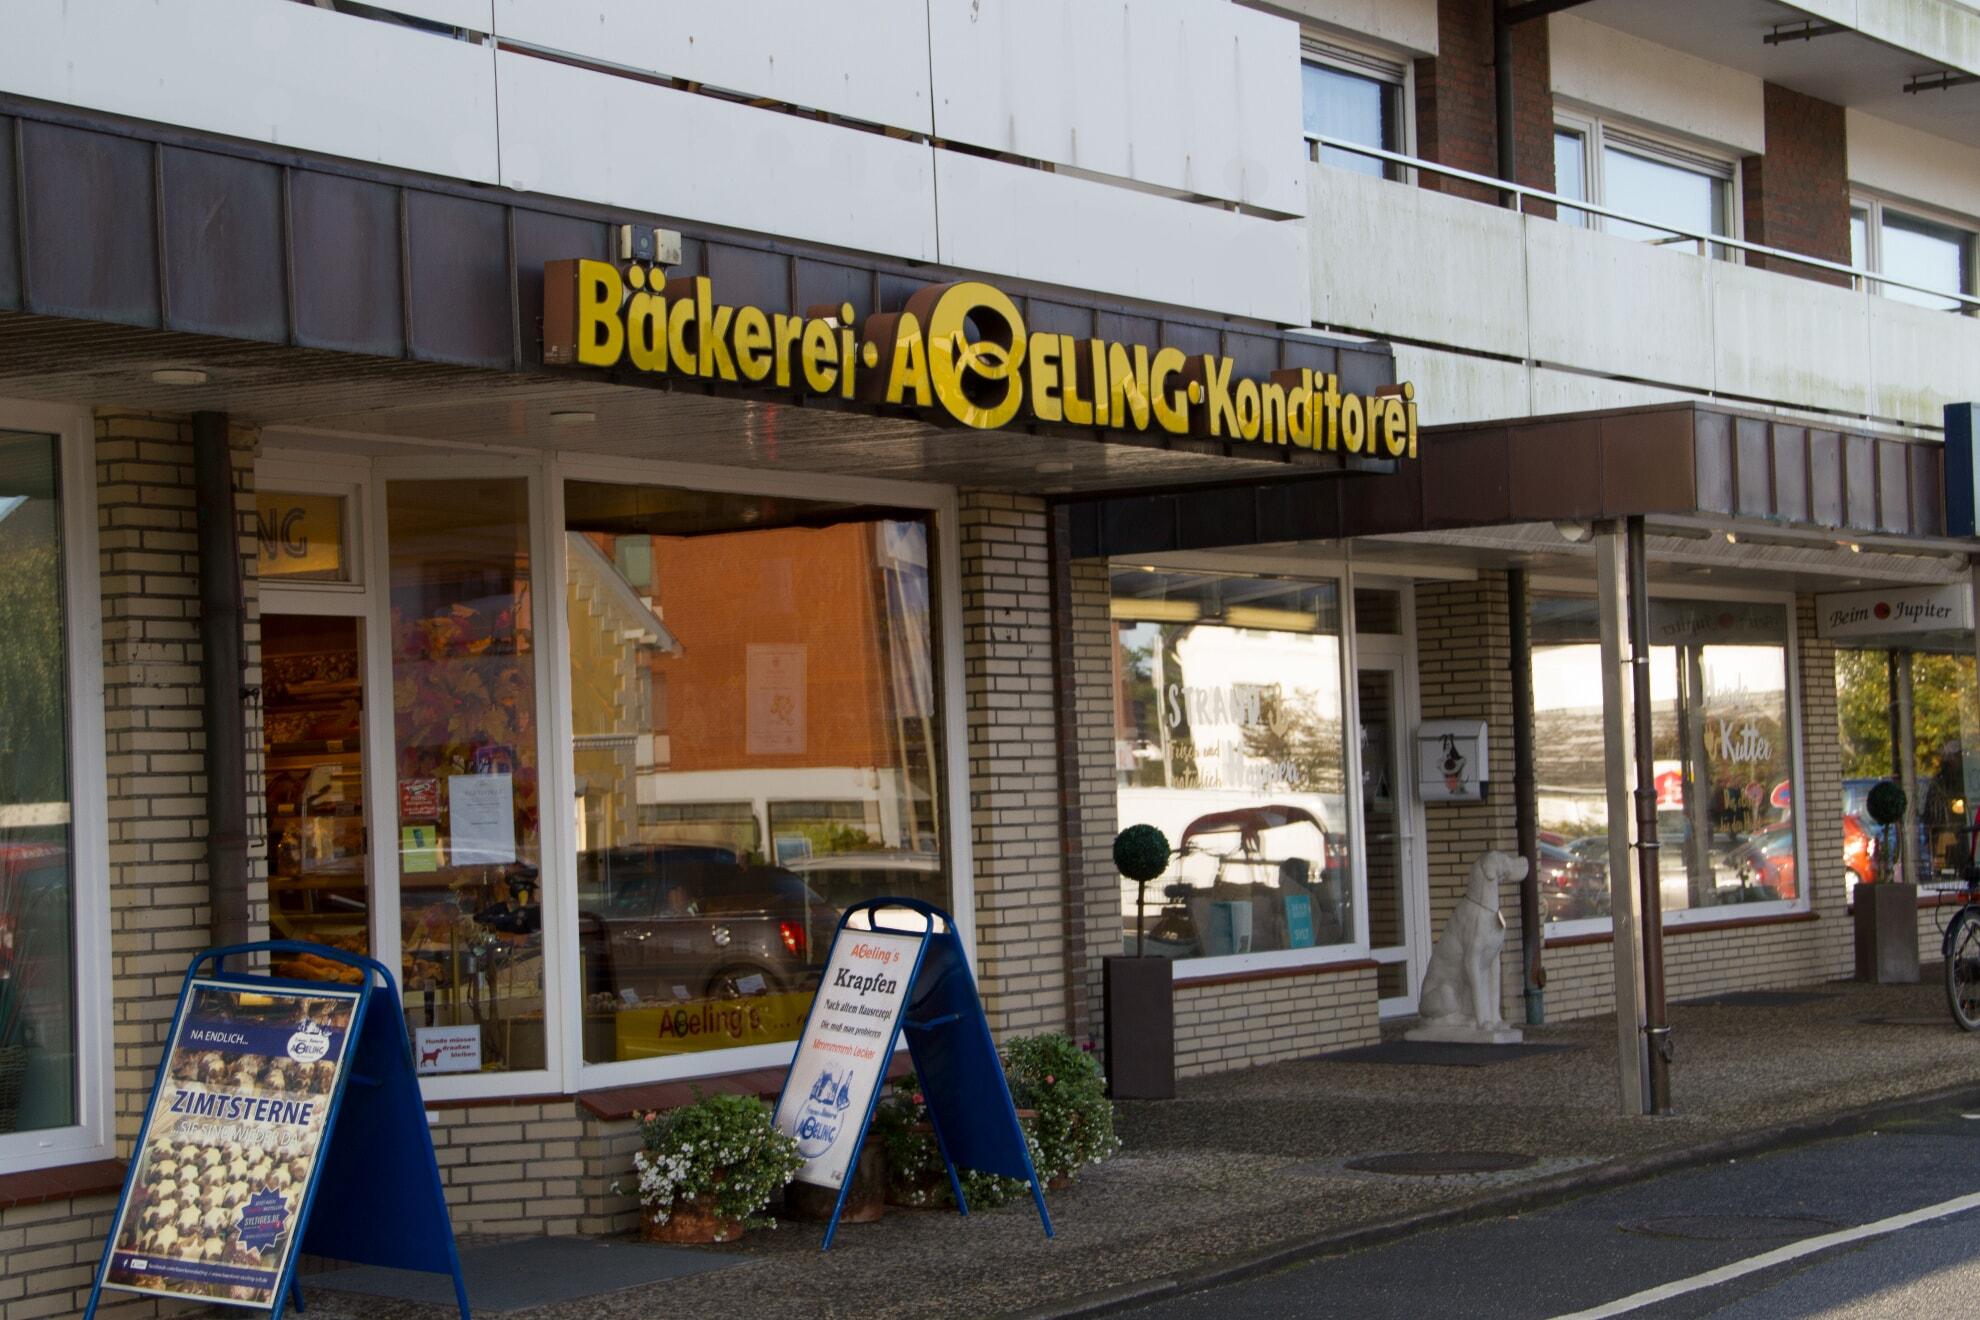 Bäckerei Abeling